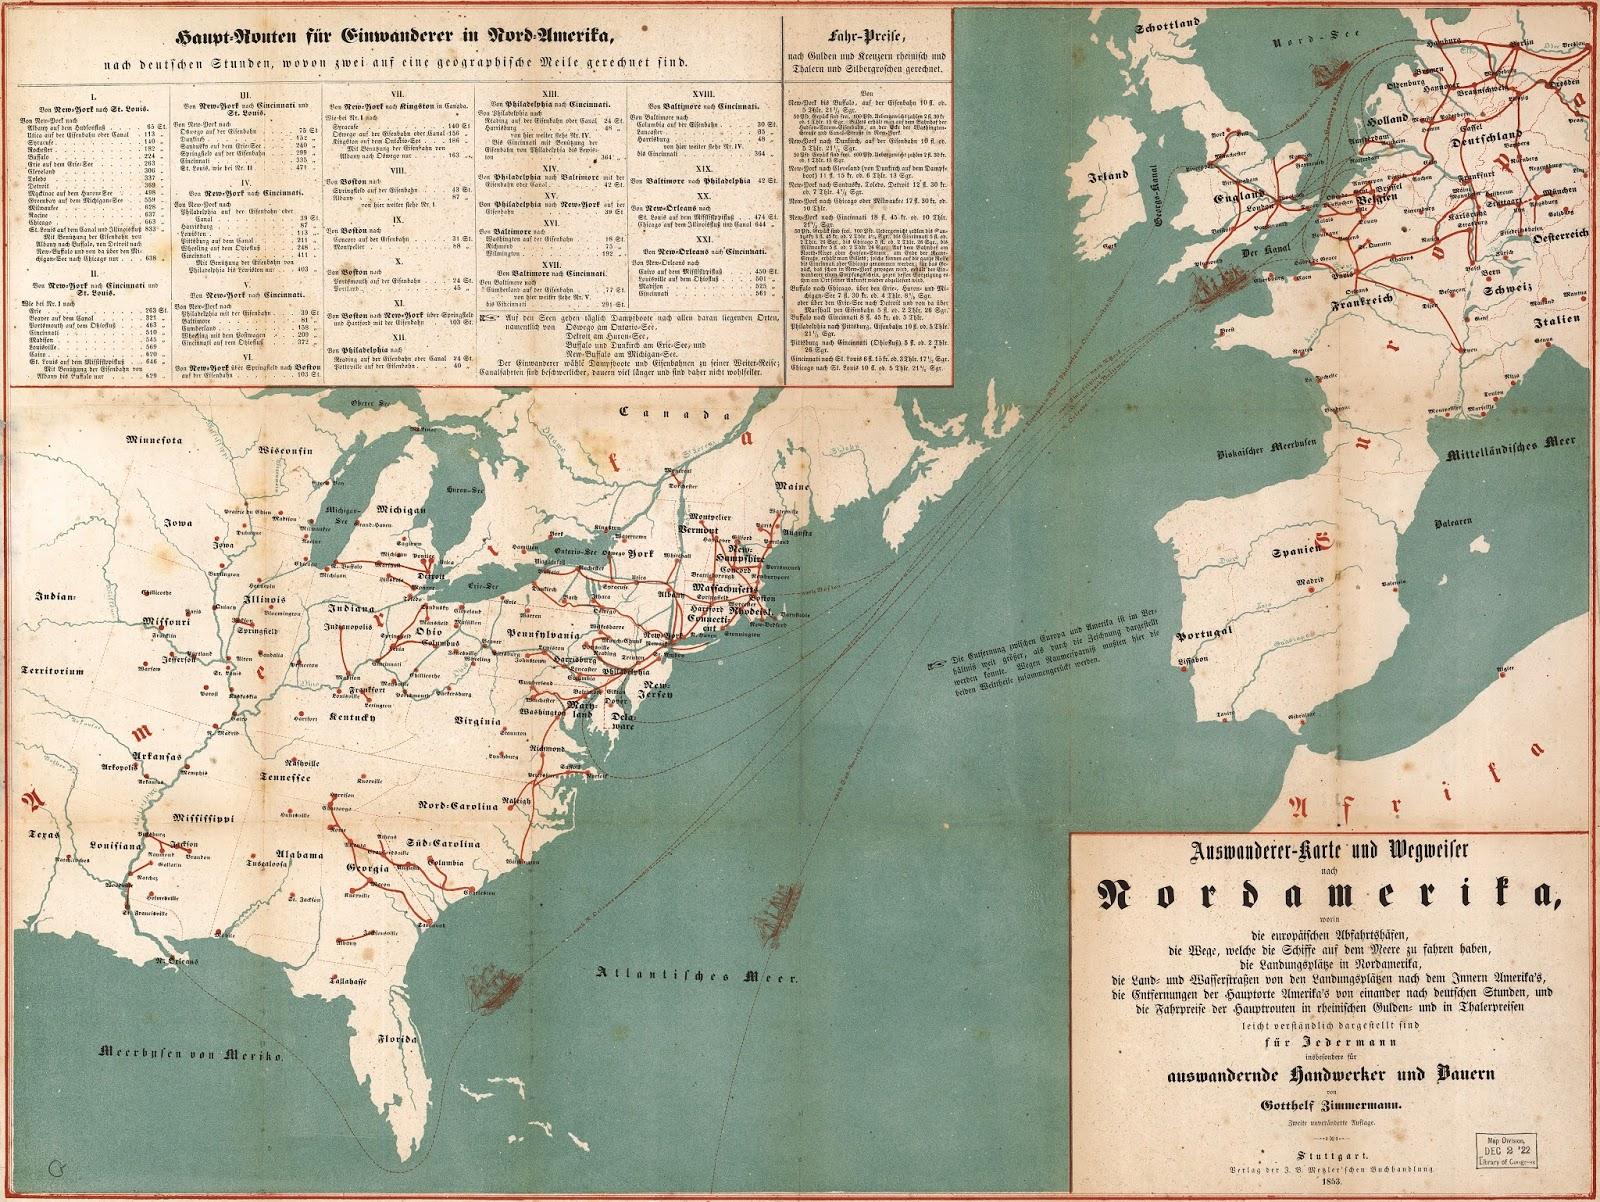 german immigrants to north america 1853 click to make bigger